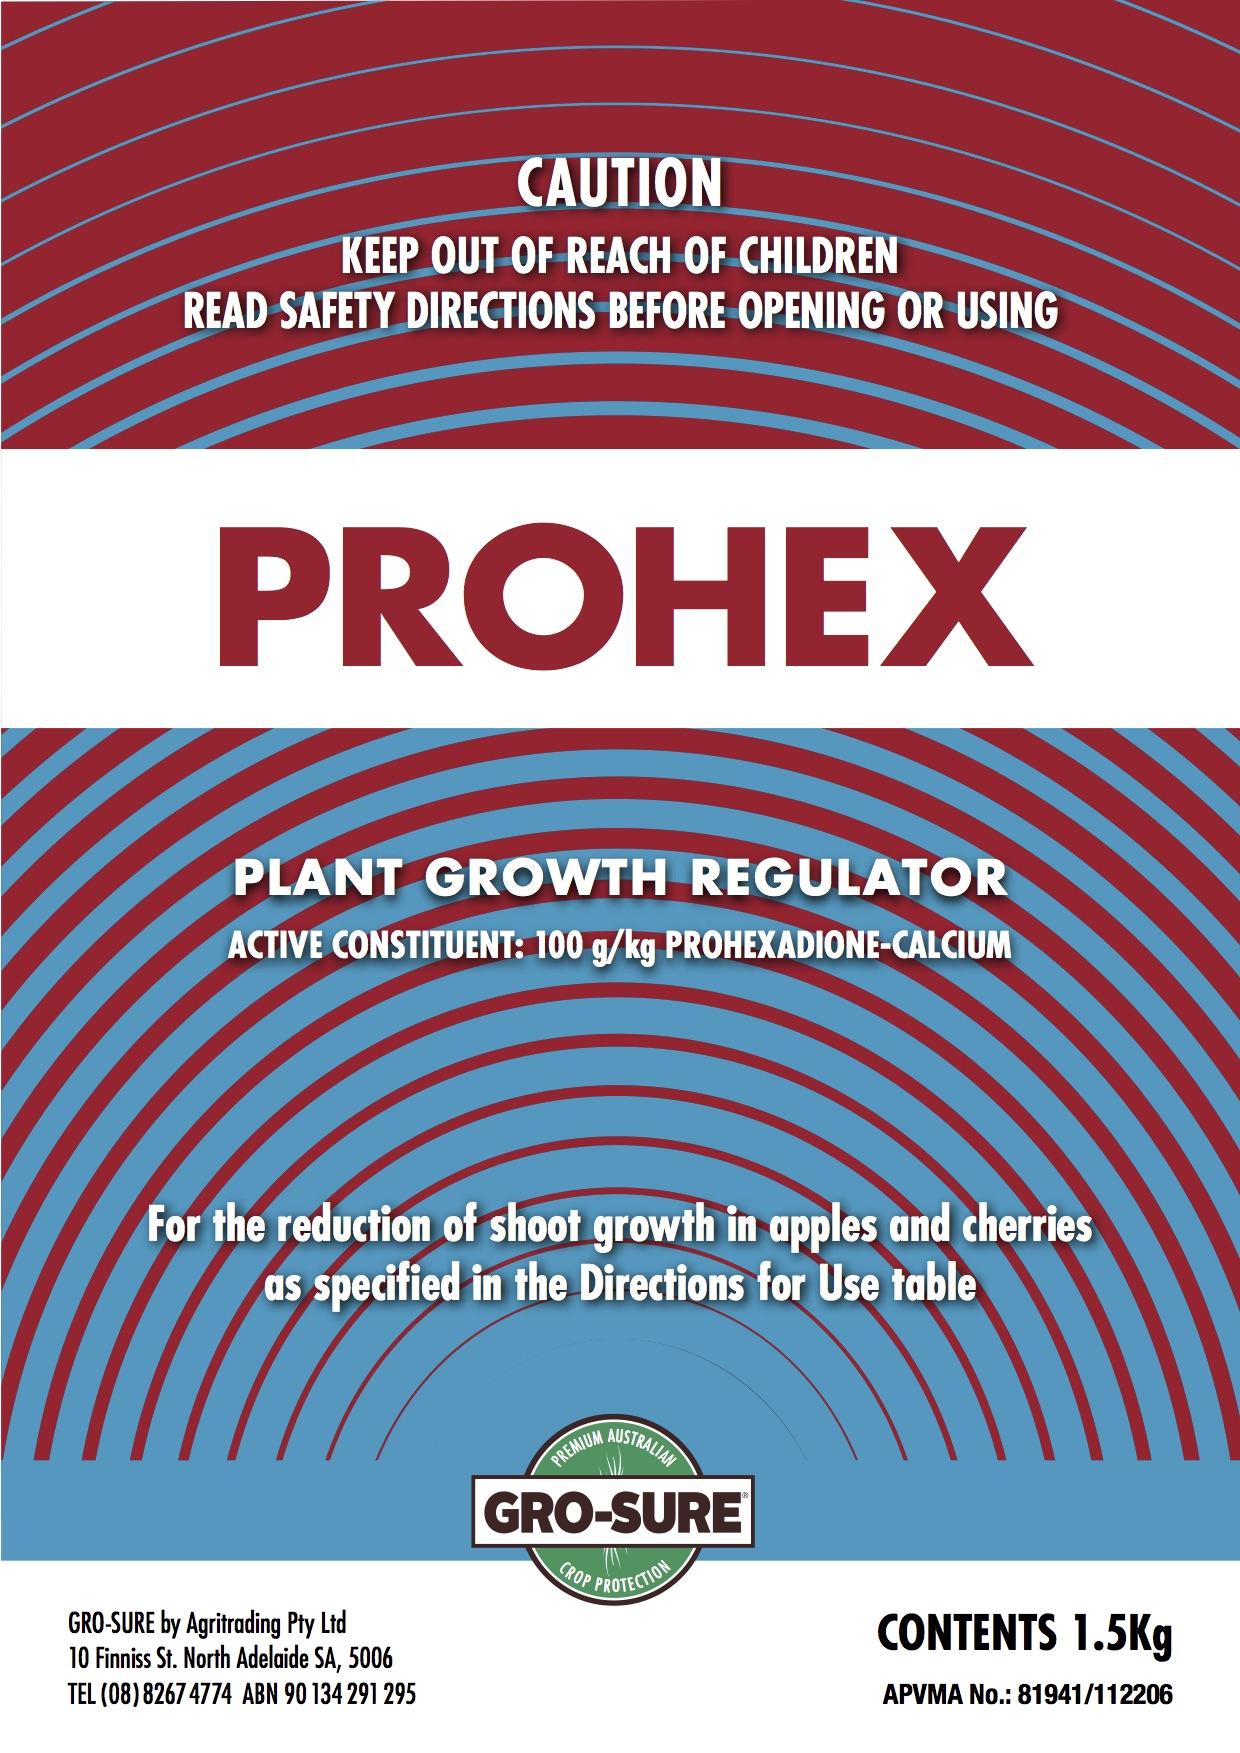 ProHex Label 0718 copy.jpg